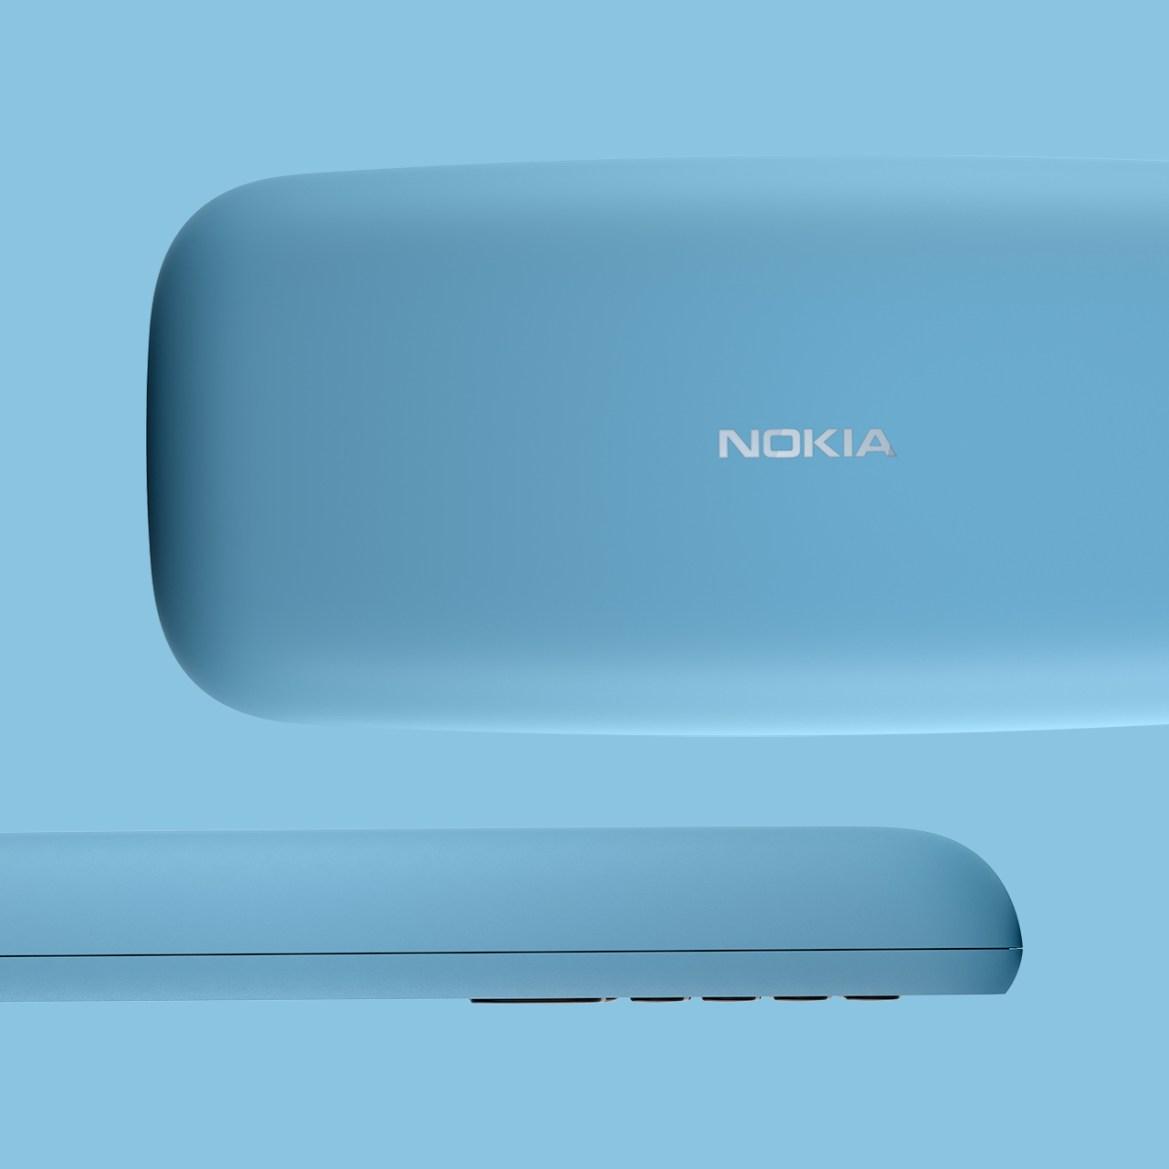 %name Nokia 105 DS (2017)   DUAL SIM, FM RADIO, TORCHLIGHT, 800MAH BATTERY, 1.8 INCH DISPLAY   Black